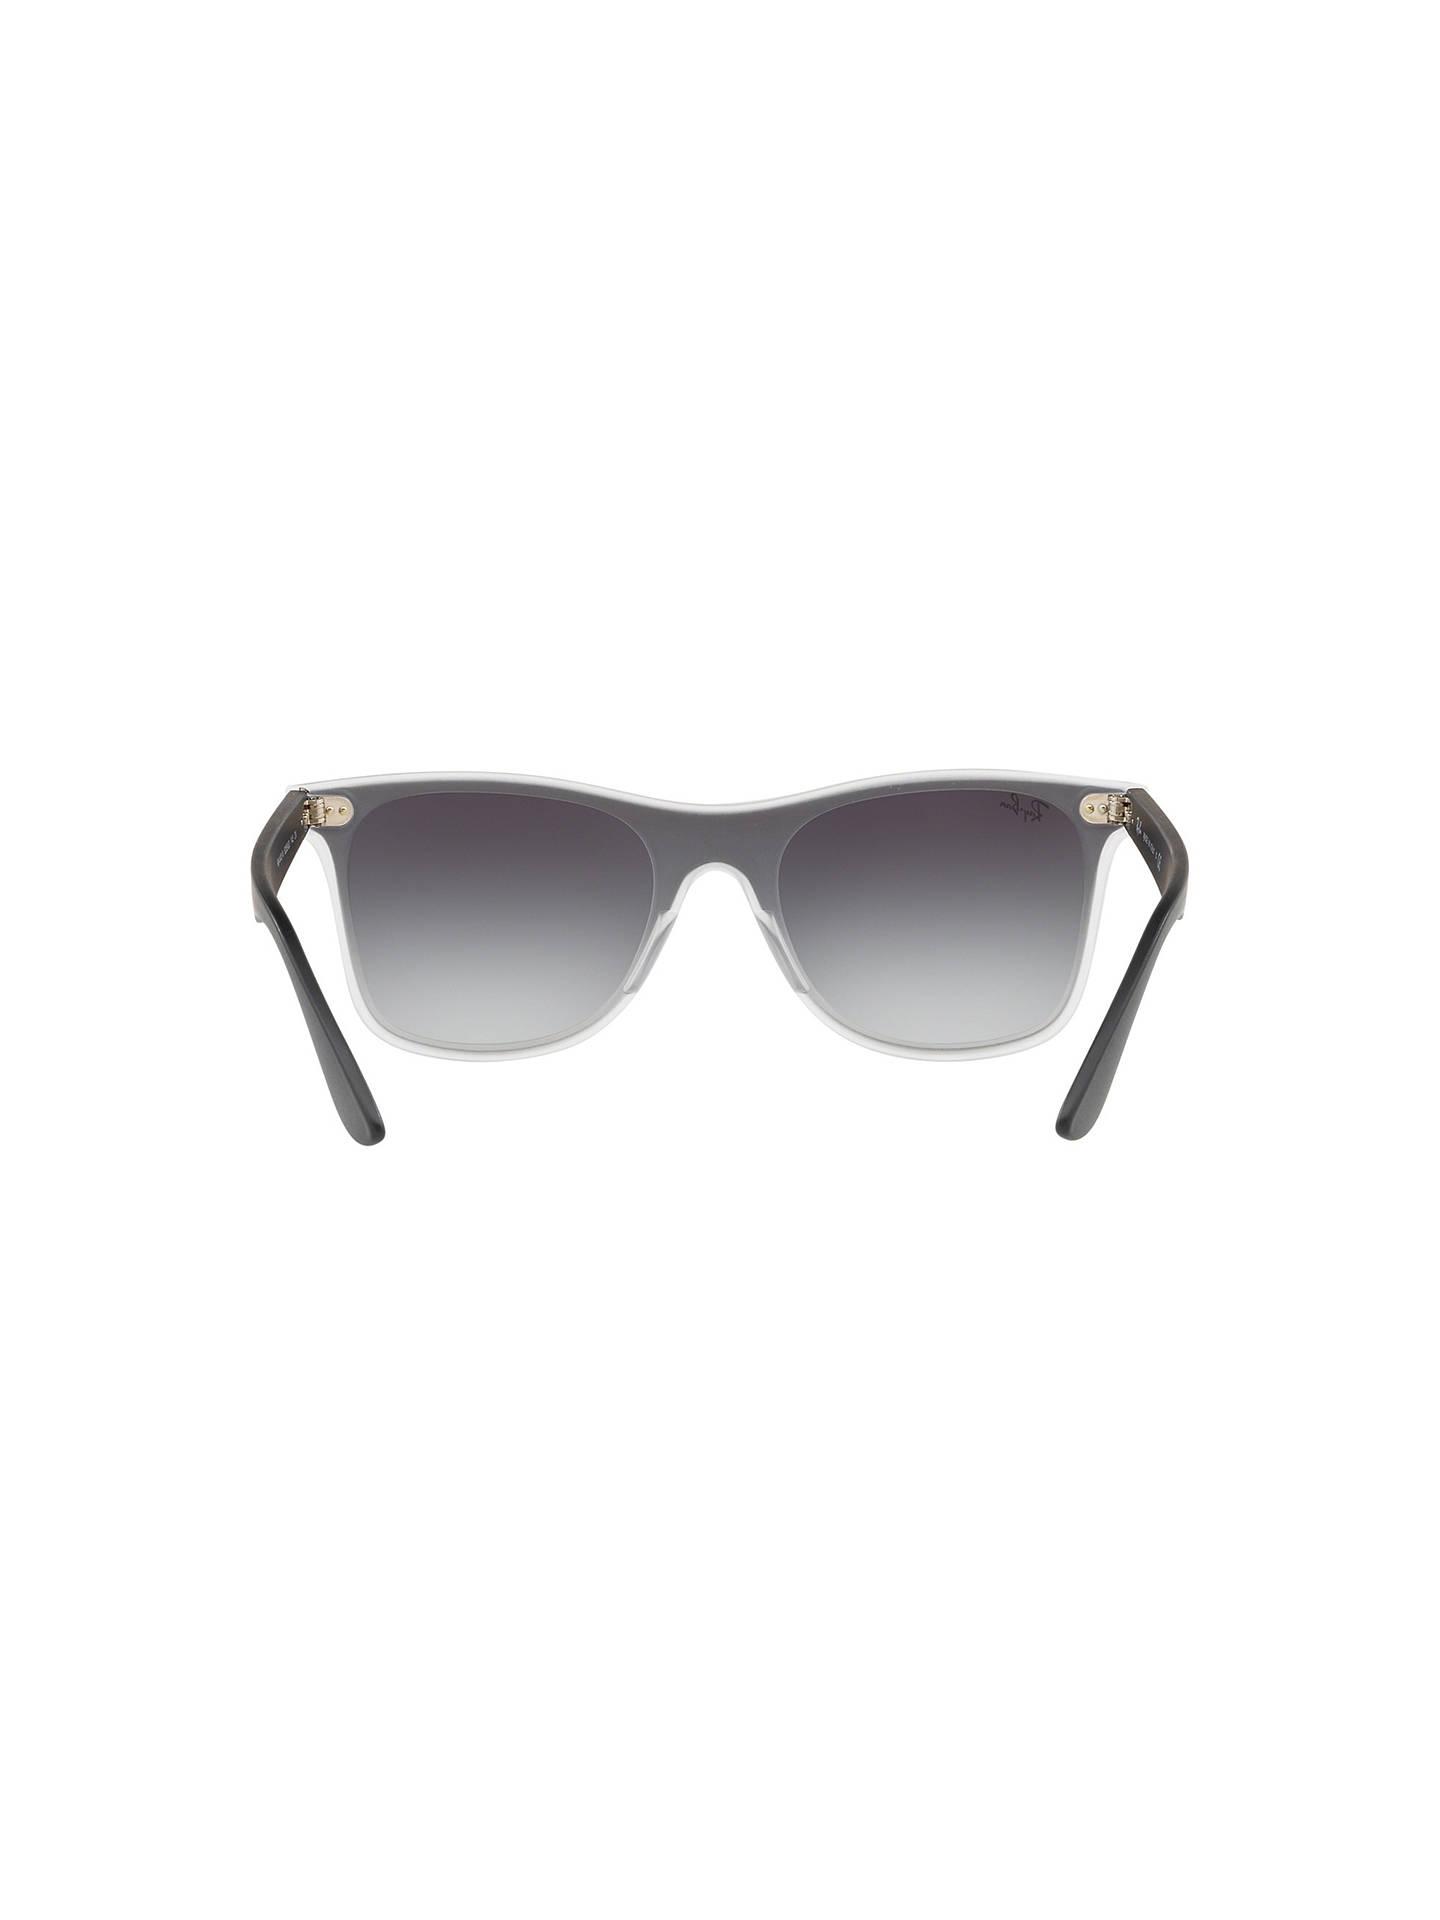 5fe44f3f40 ... Buy Ray-Ban RB4440 Unisex Mirrored Sunglasses